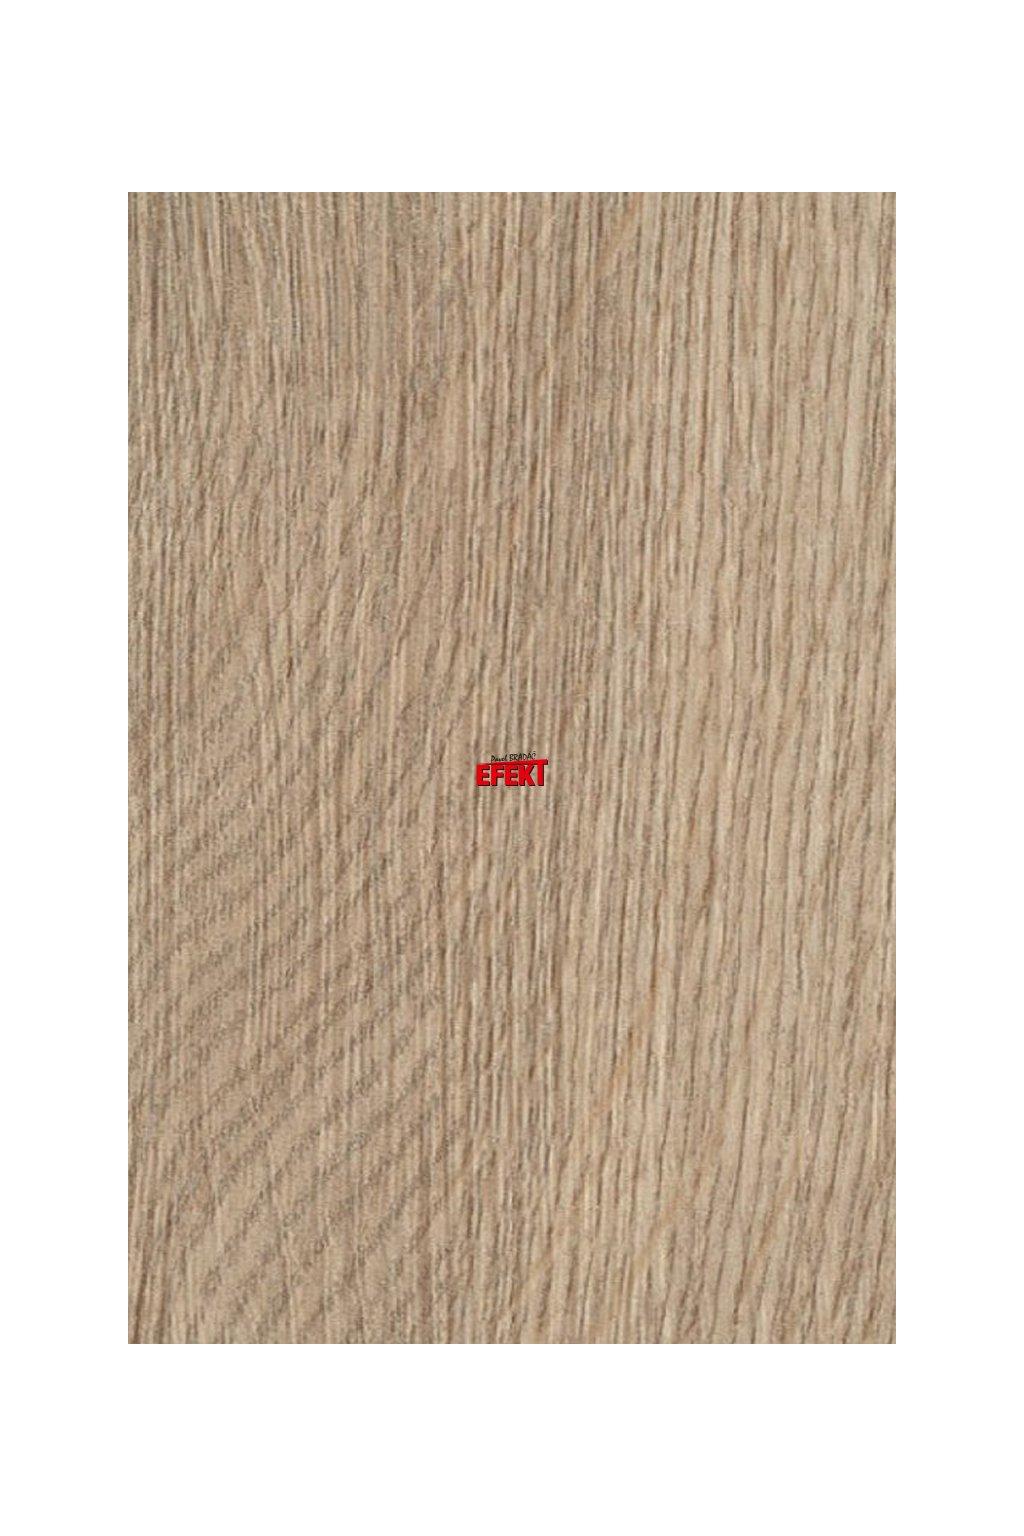 Gerflor Timberline Oak Select Medium 0452